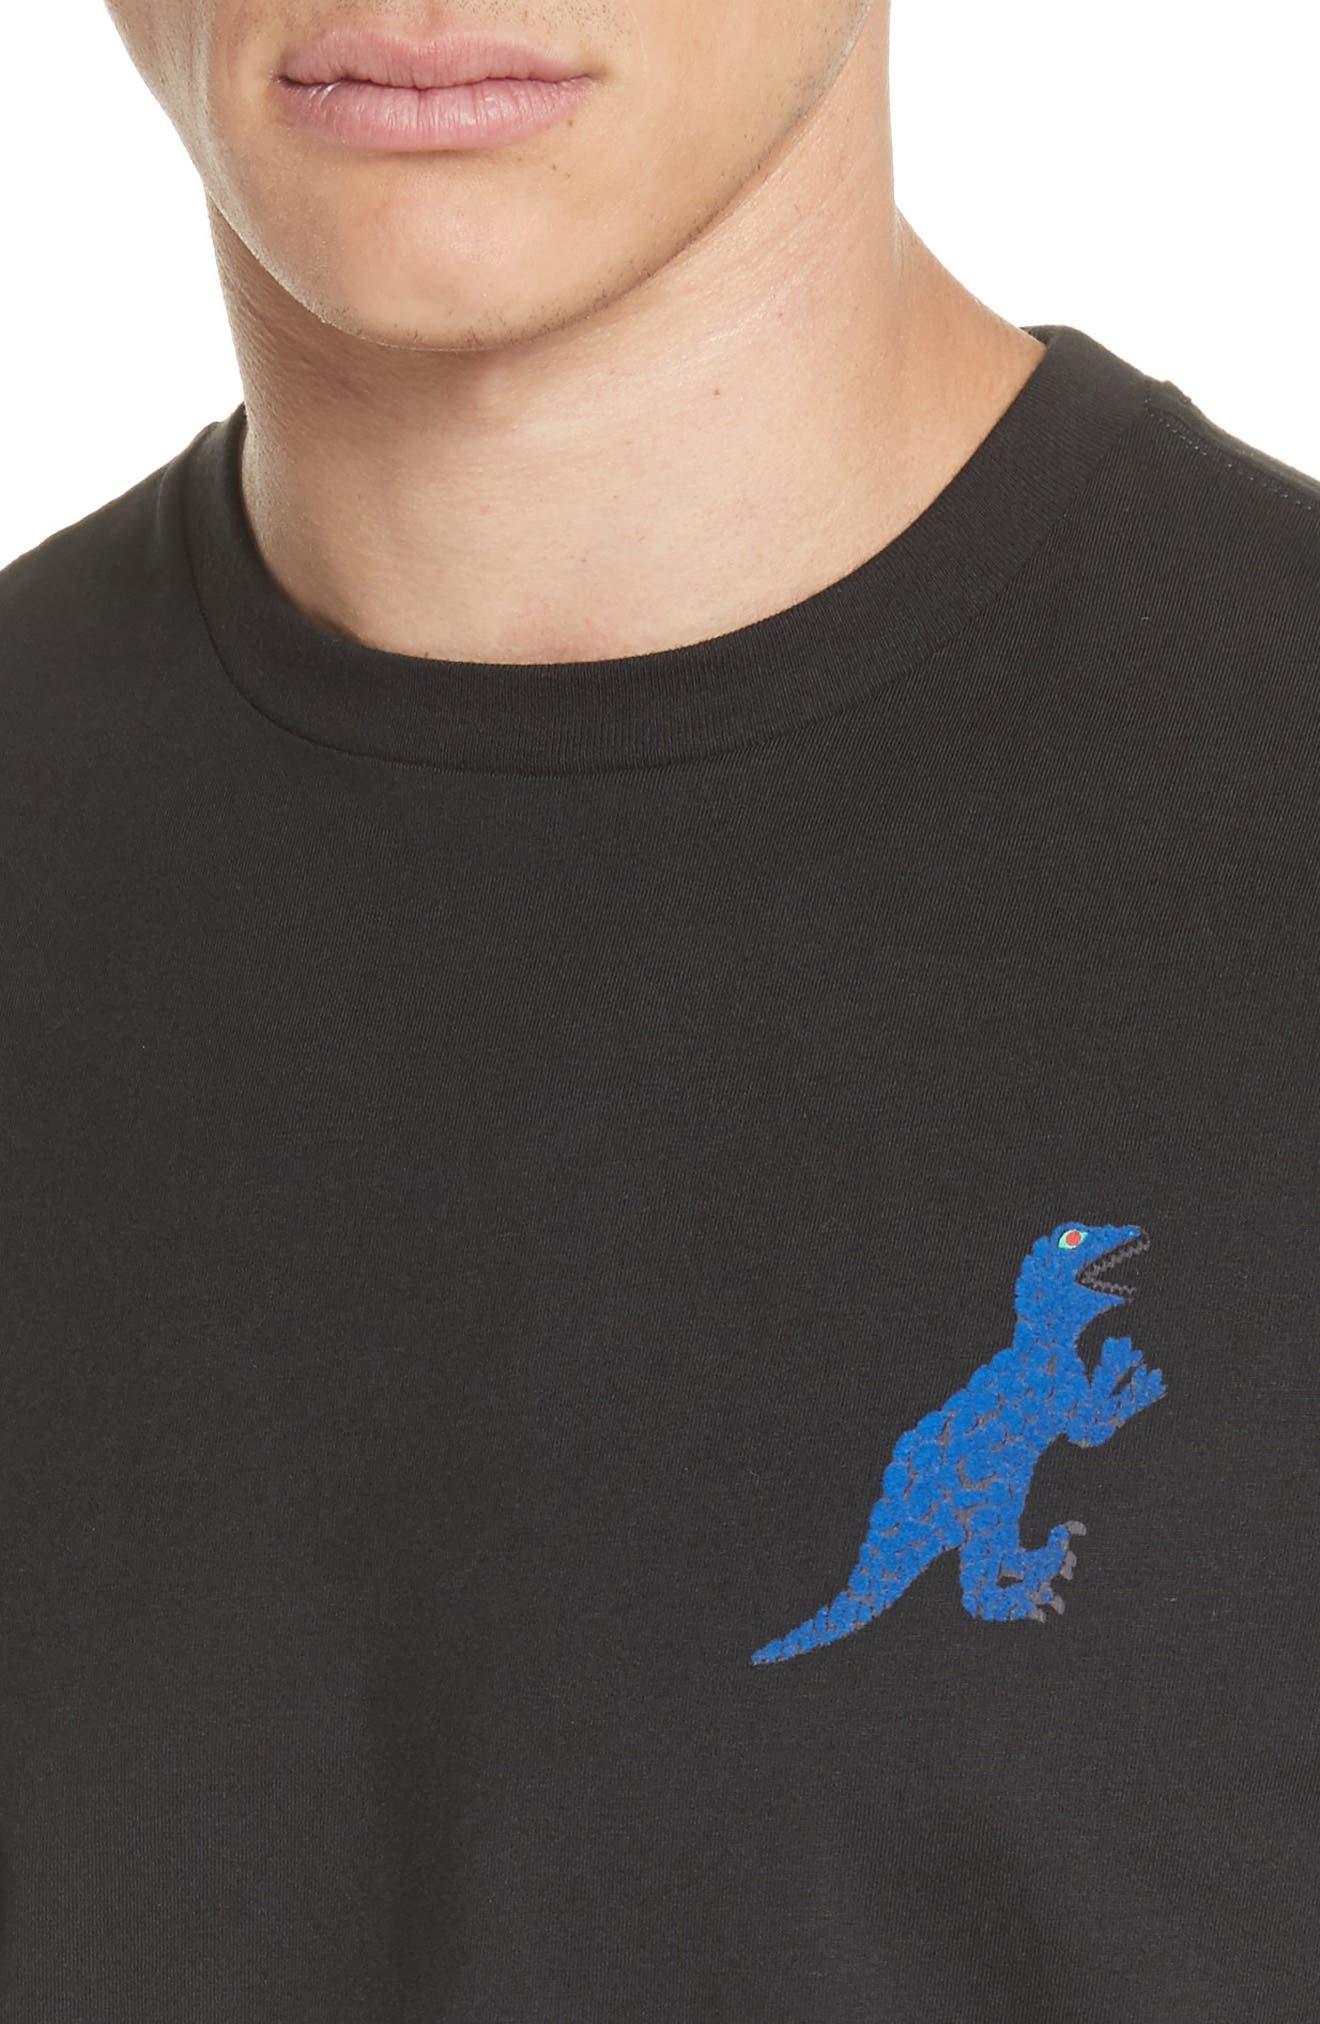 Dino Graphic T-Shirt,                             Alternate thumbnail 4, color,                             BLACK